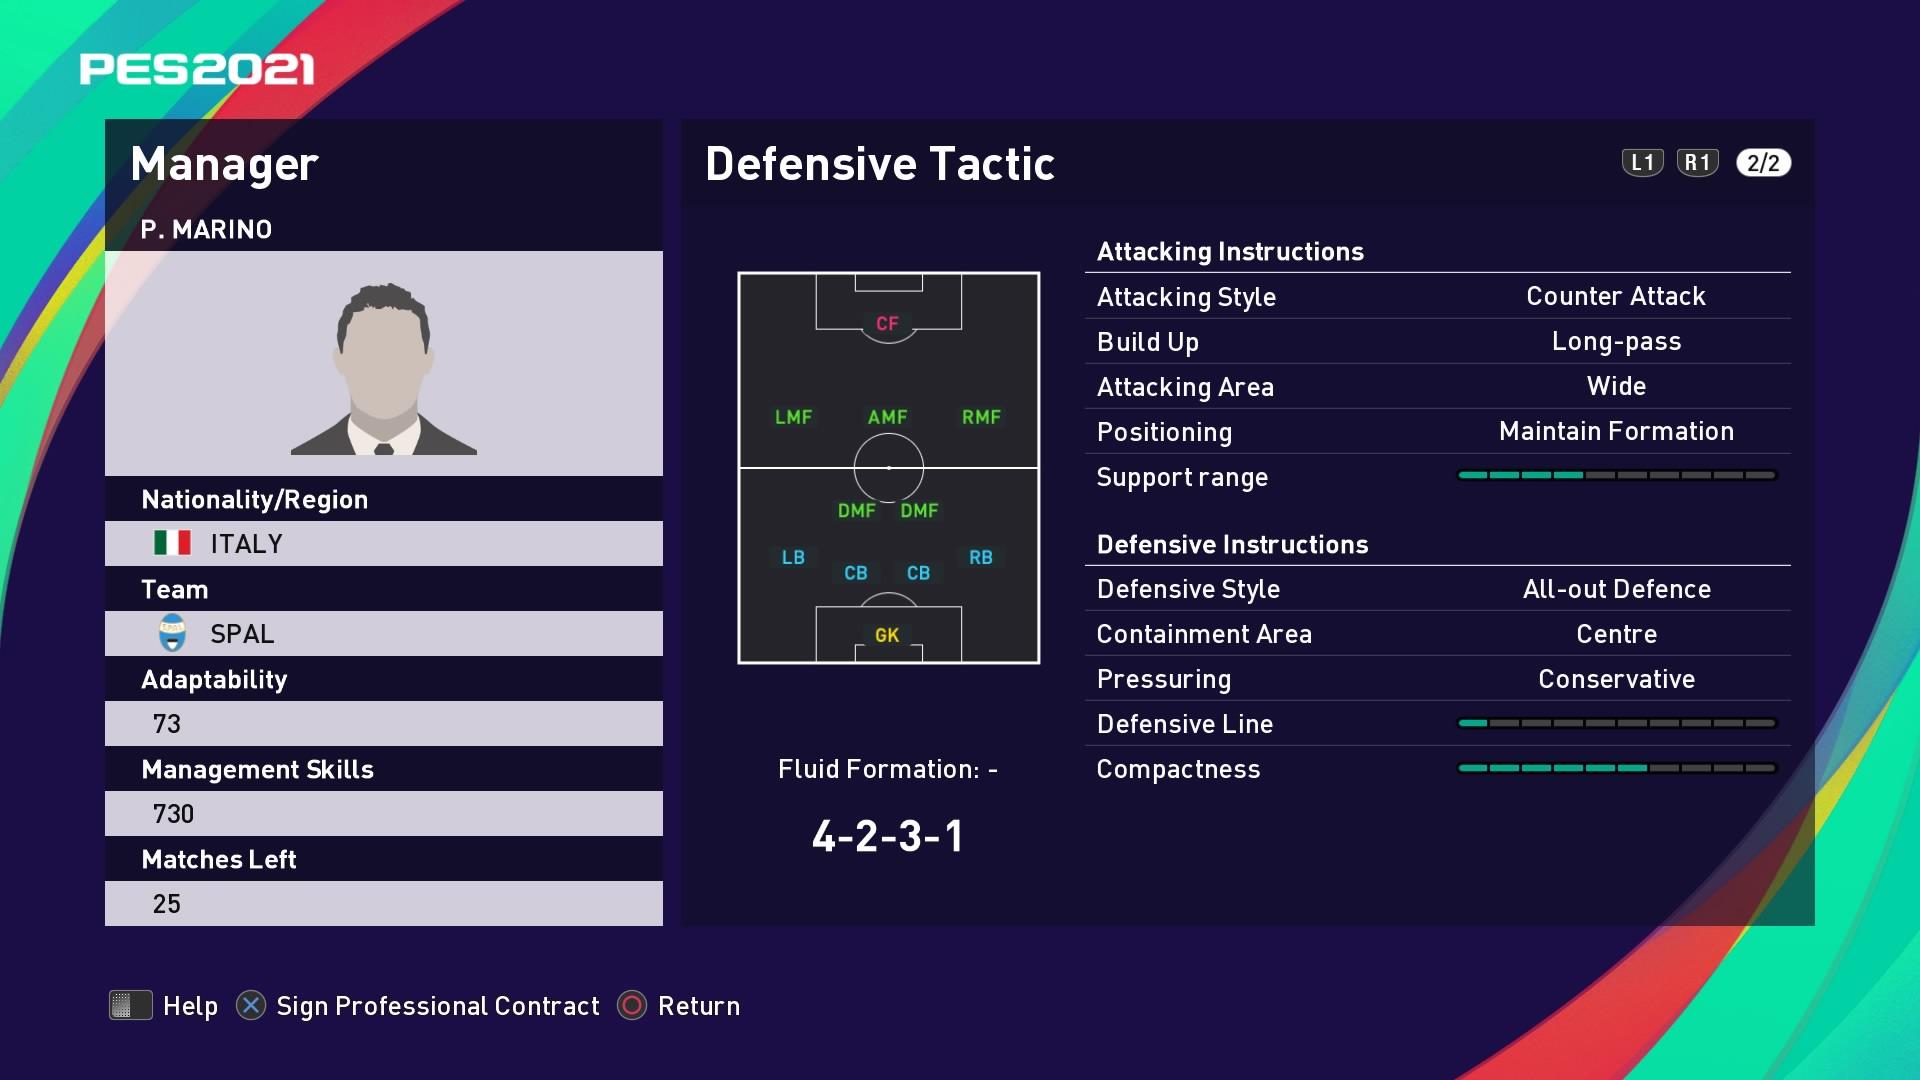 P. Marino (Pasquale Marino) Defensive Tactic in PES 2021 myClub